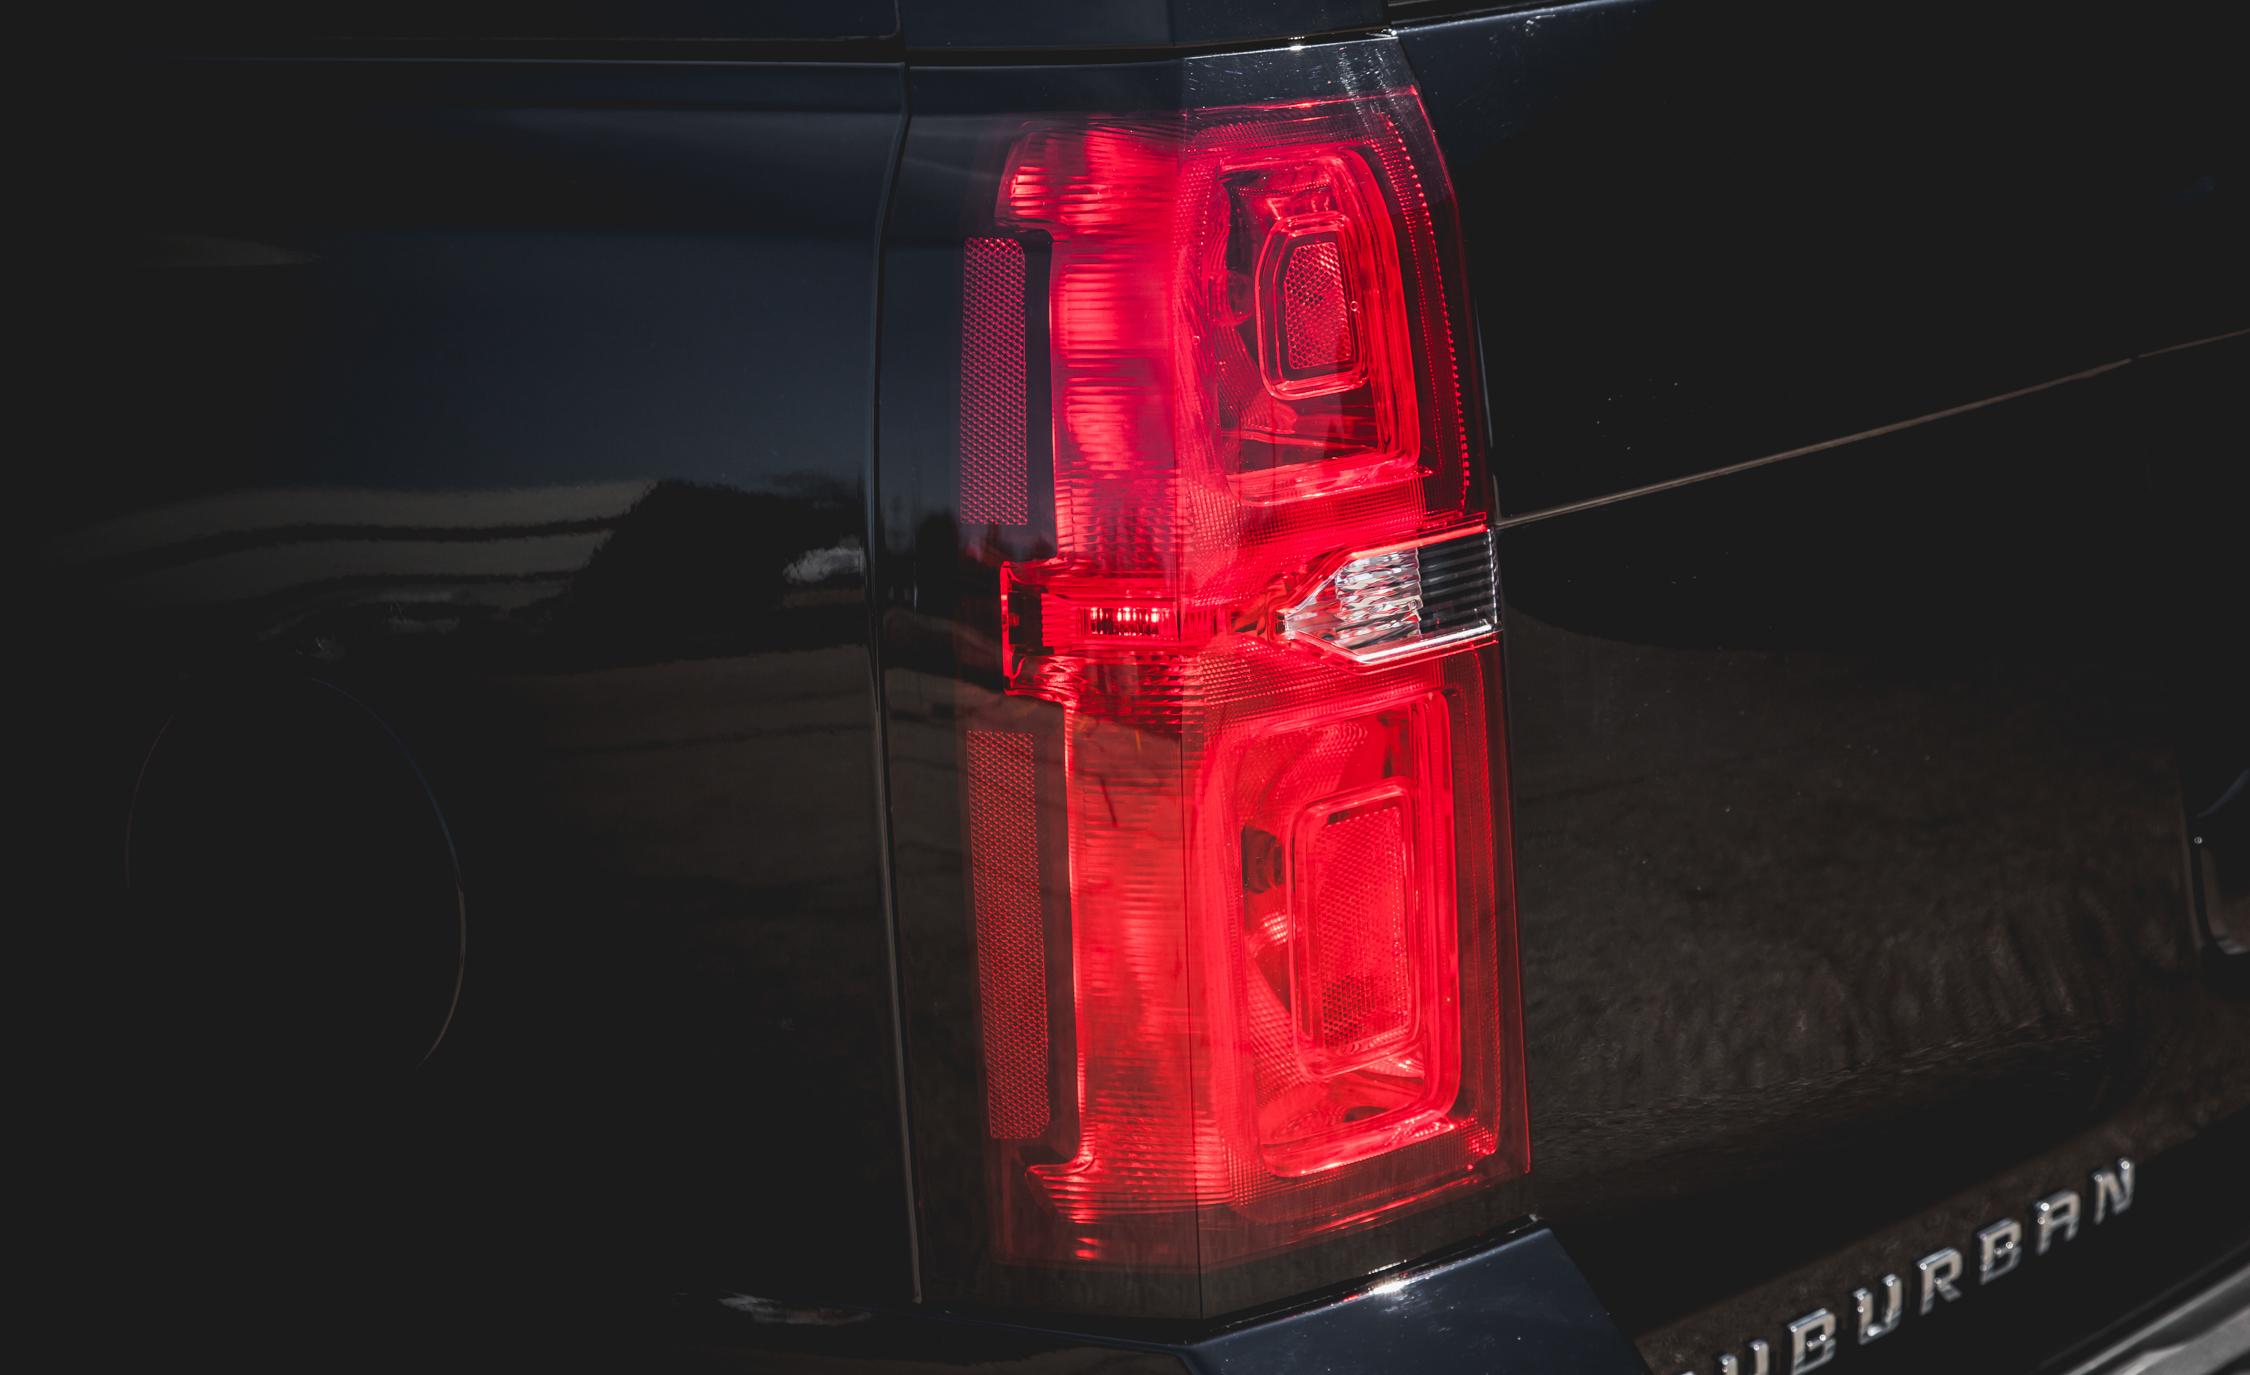 2015 Chevrolet Suburban LTZ Exterior Taillight